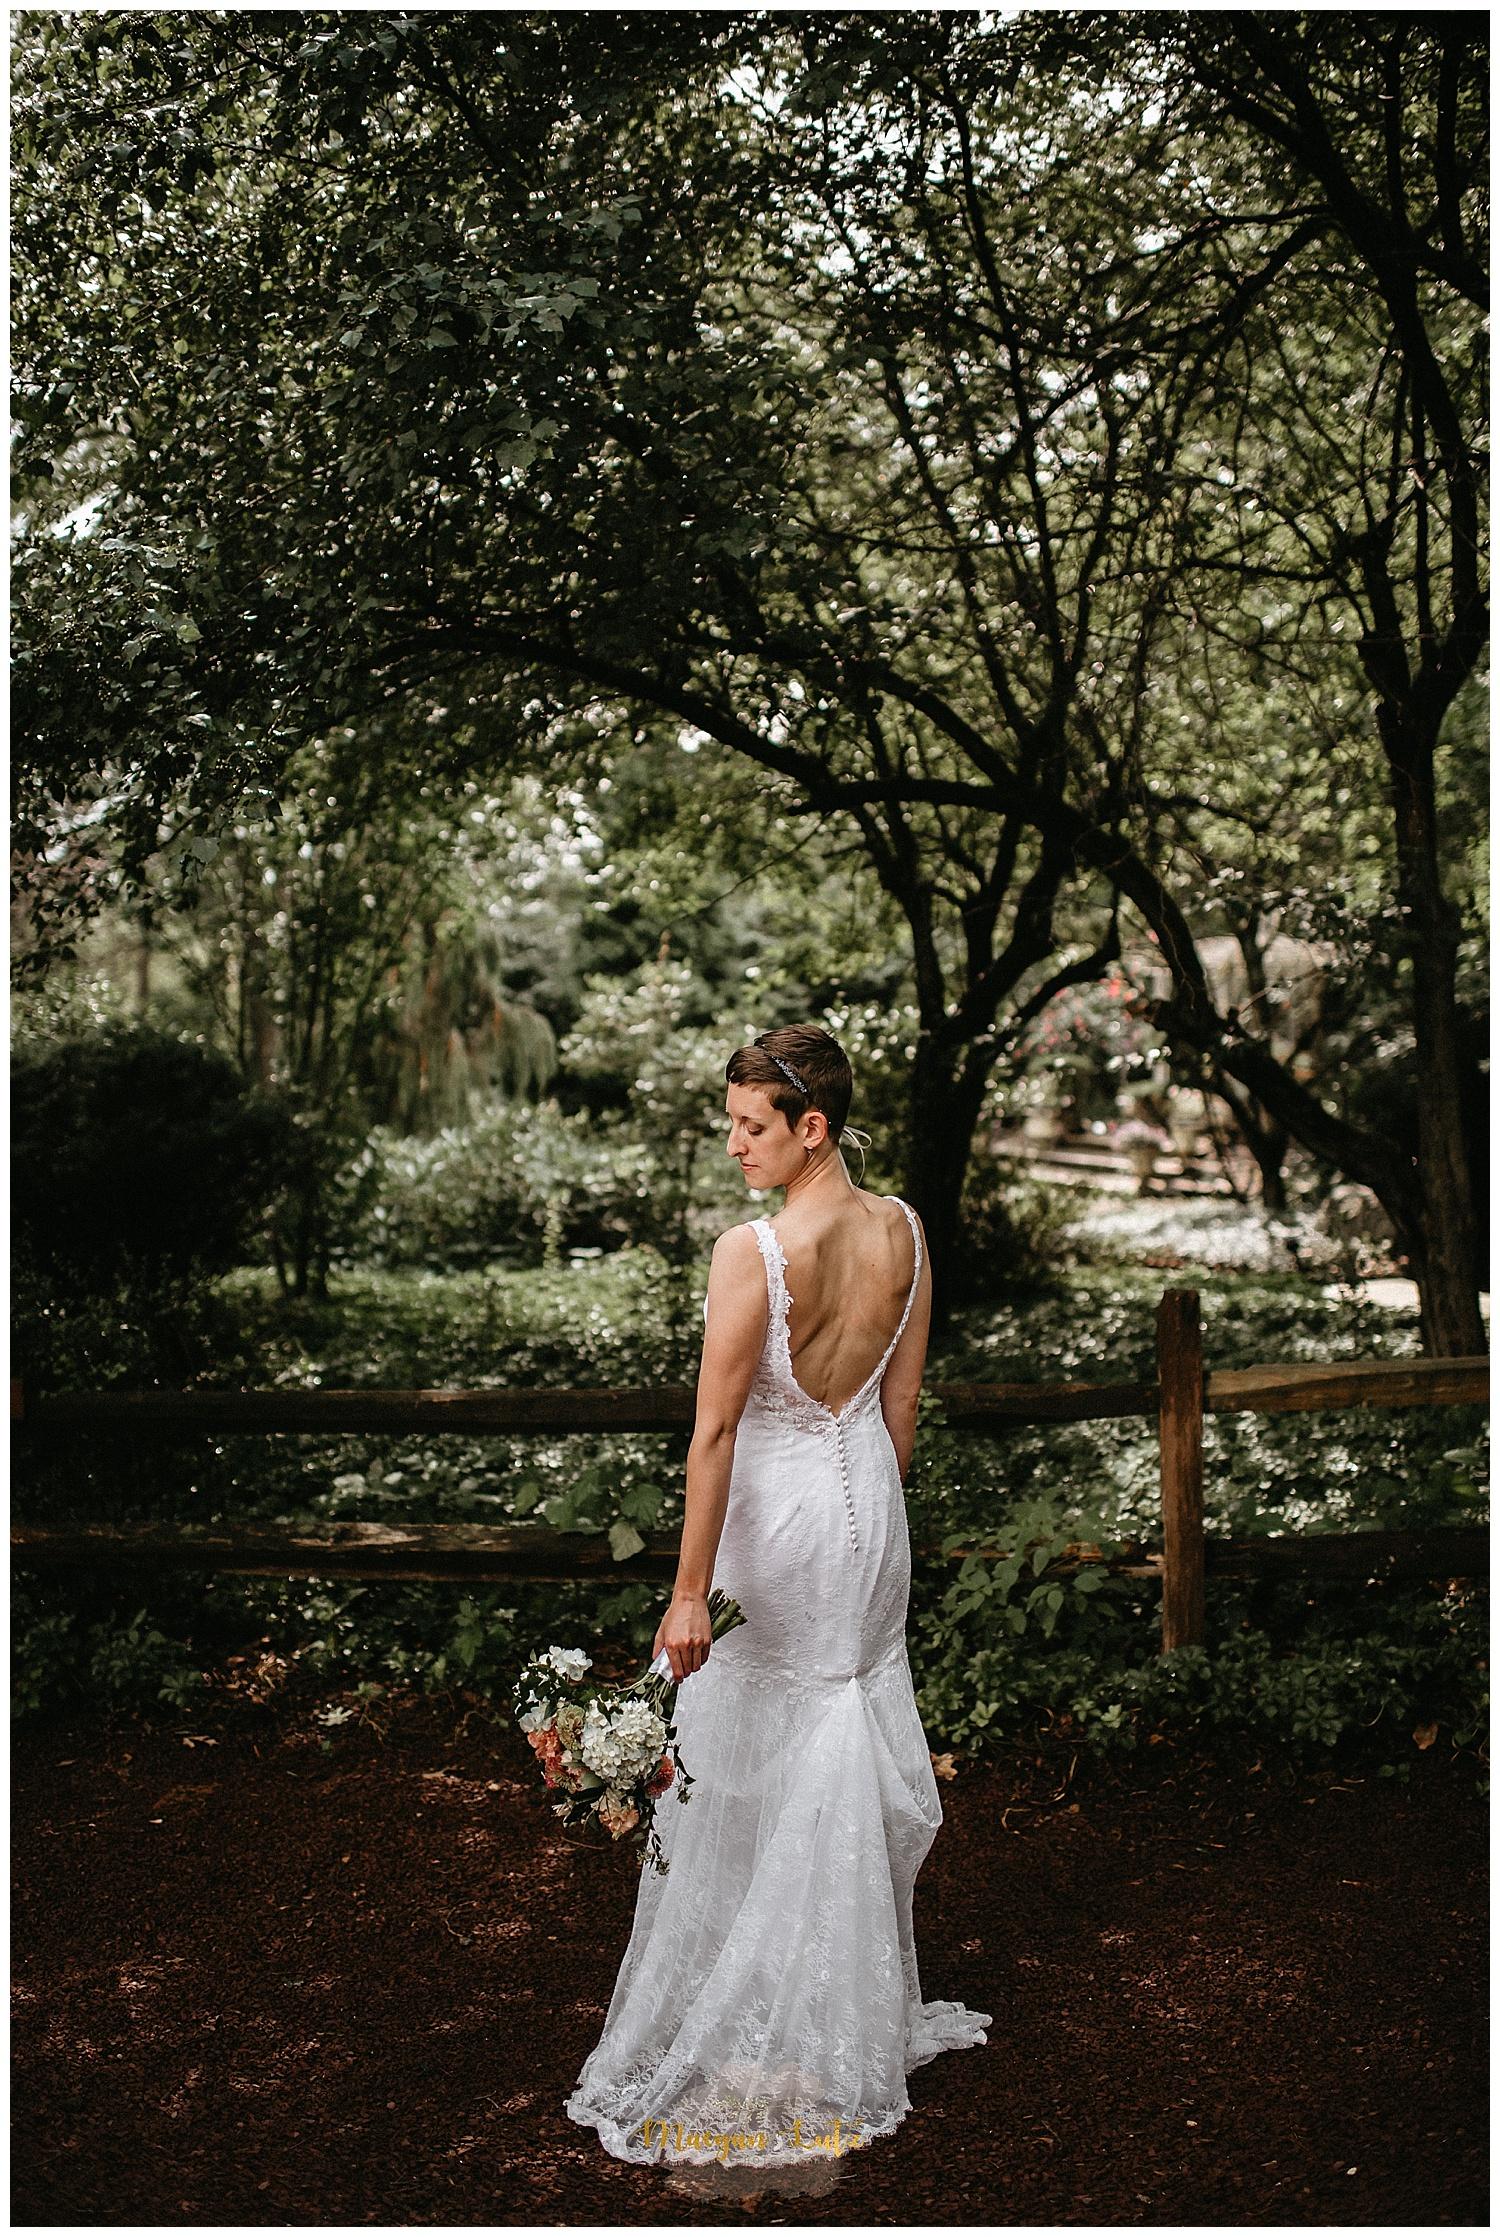 NEPA-Wedding-Photographer-at-Carmens-Country-Inn-and-Gardens-Drums-PA_0014.jpg